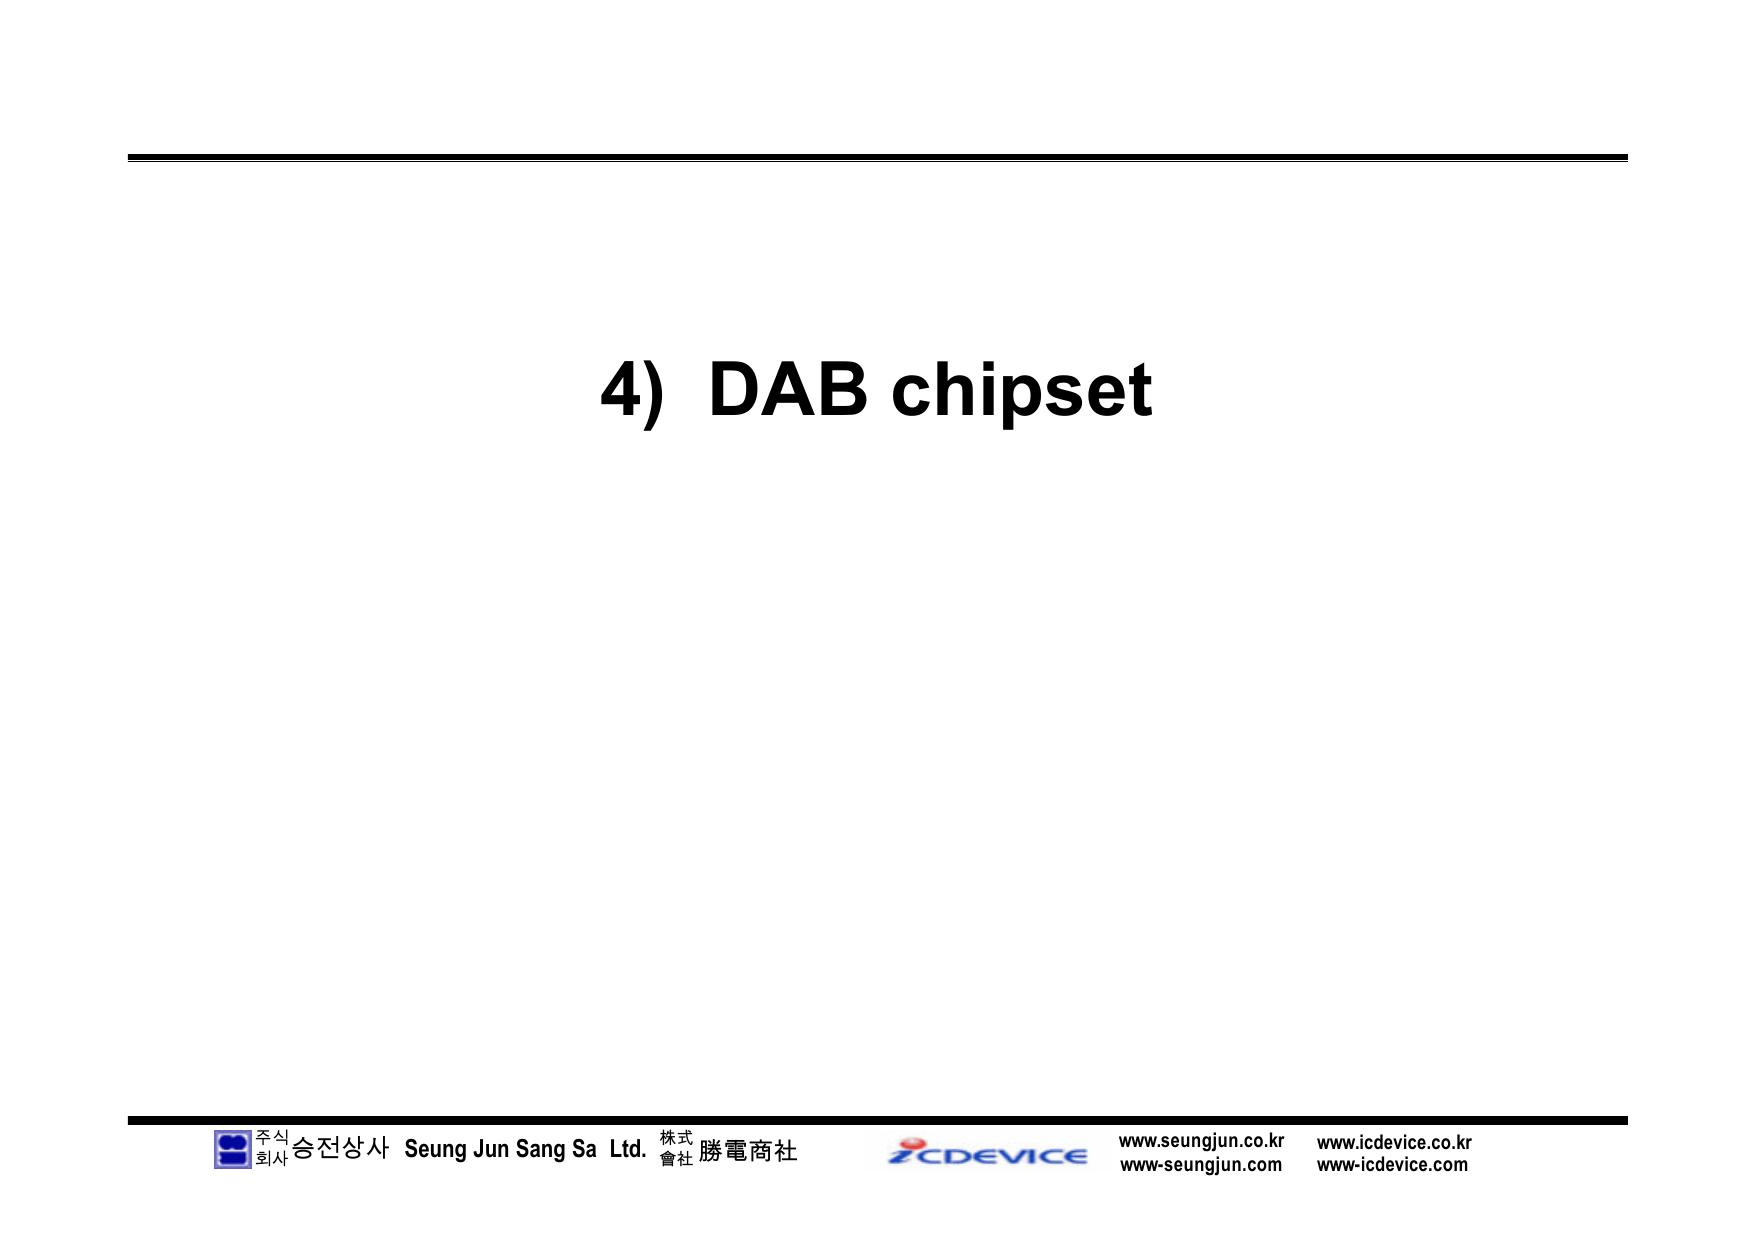 4 Dab Chipset